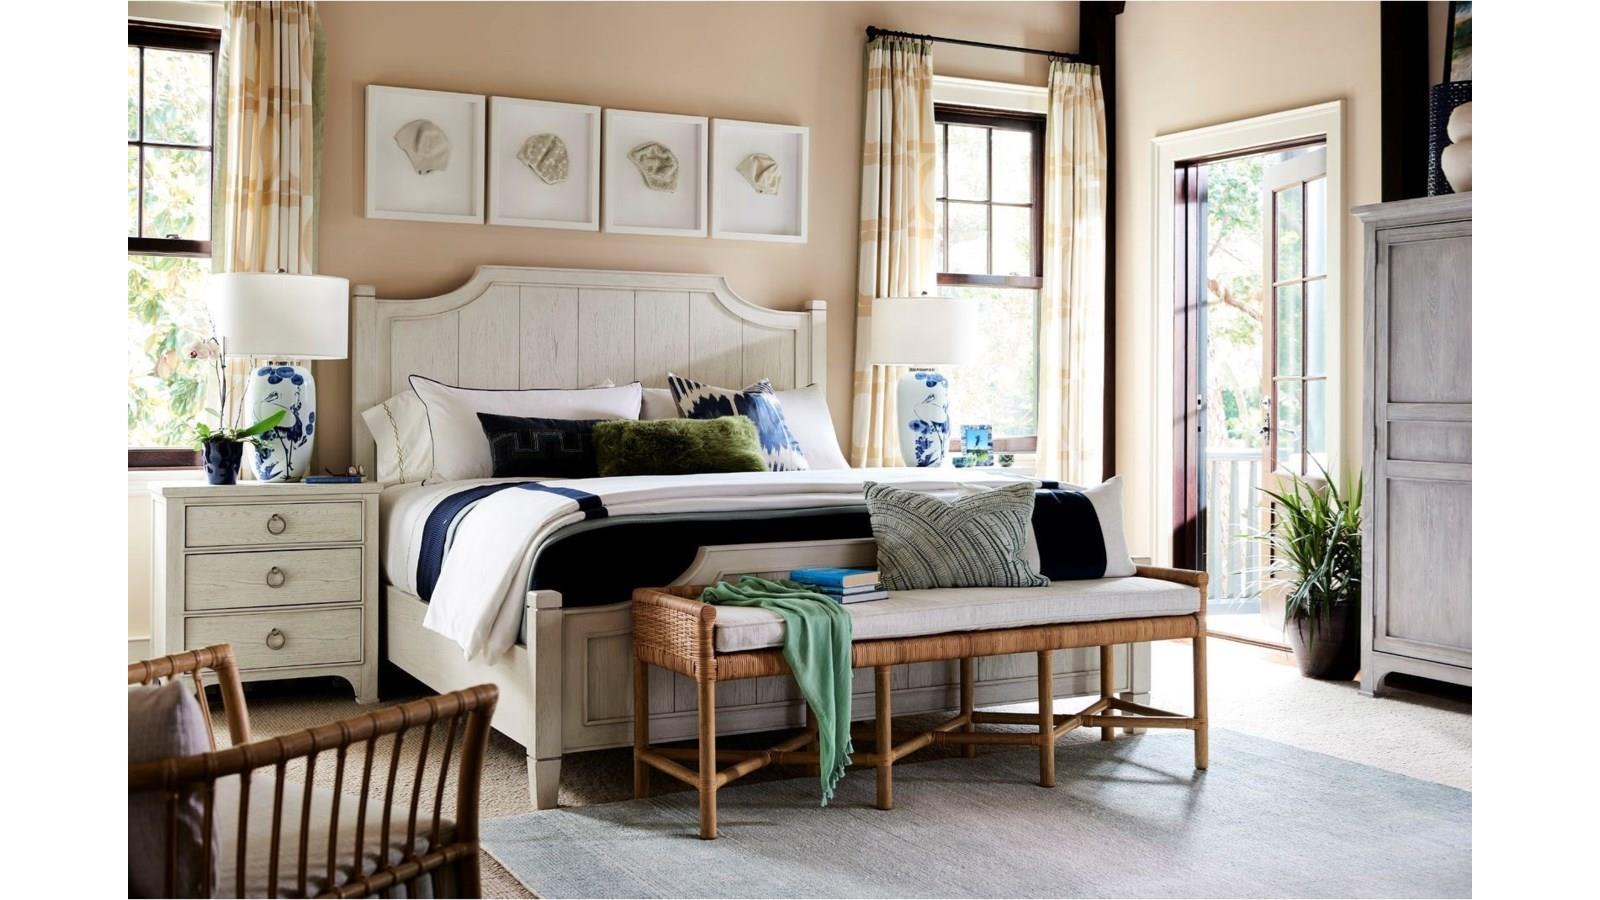 Esprit Decor Home Furnishings Chesapeake Va from images.furnituredealer.net